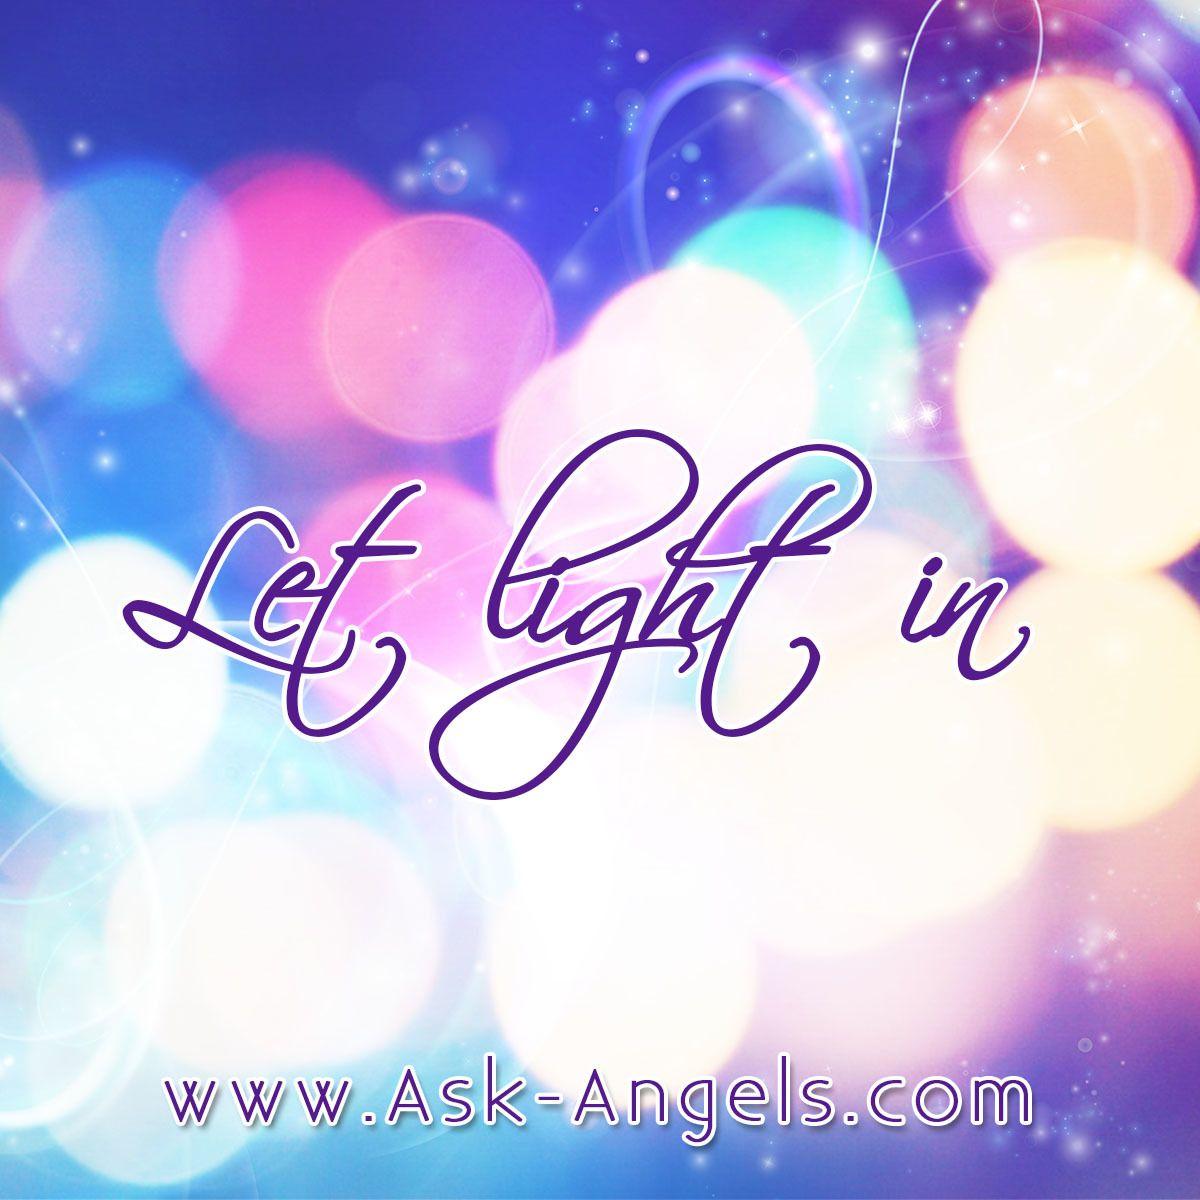 Spiritual Life Quotes And Sayings Let Light In Angelicinspiration Askangels Spiritual  Facebook